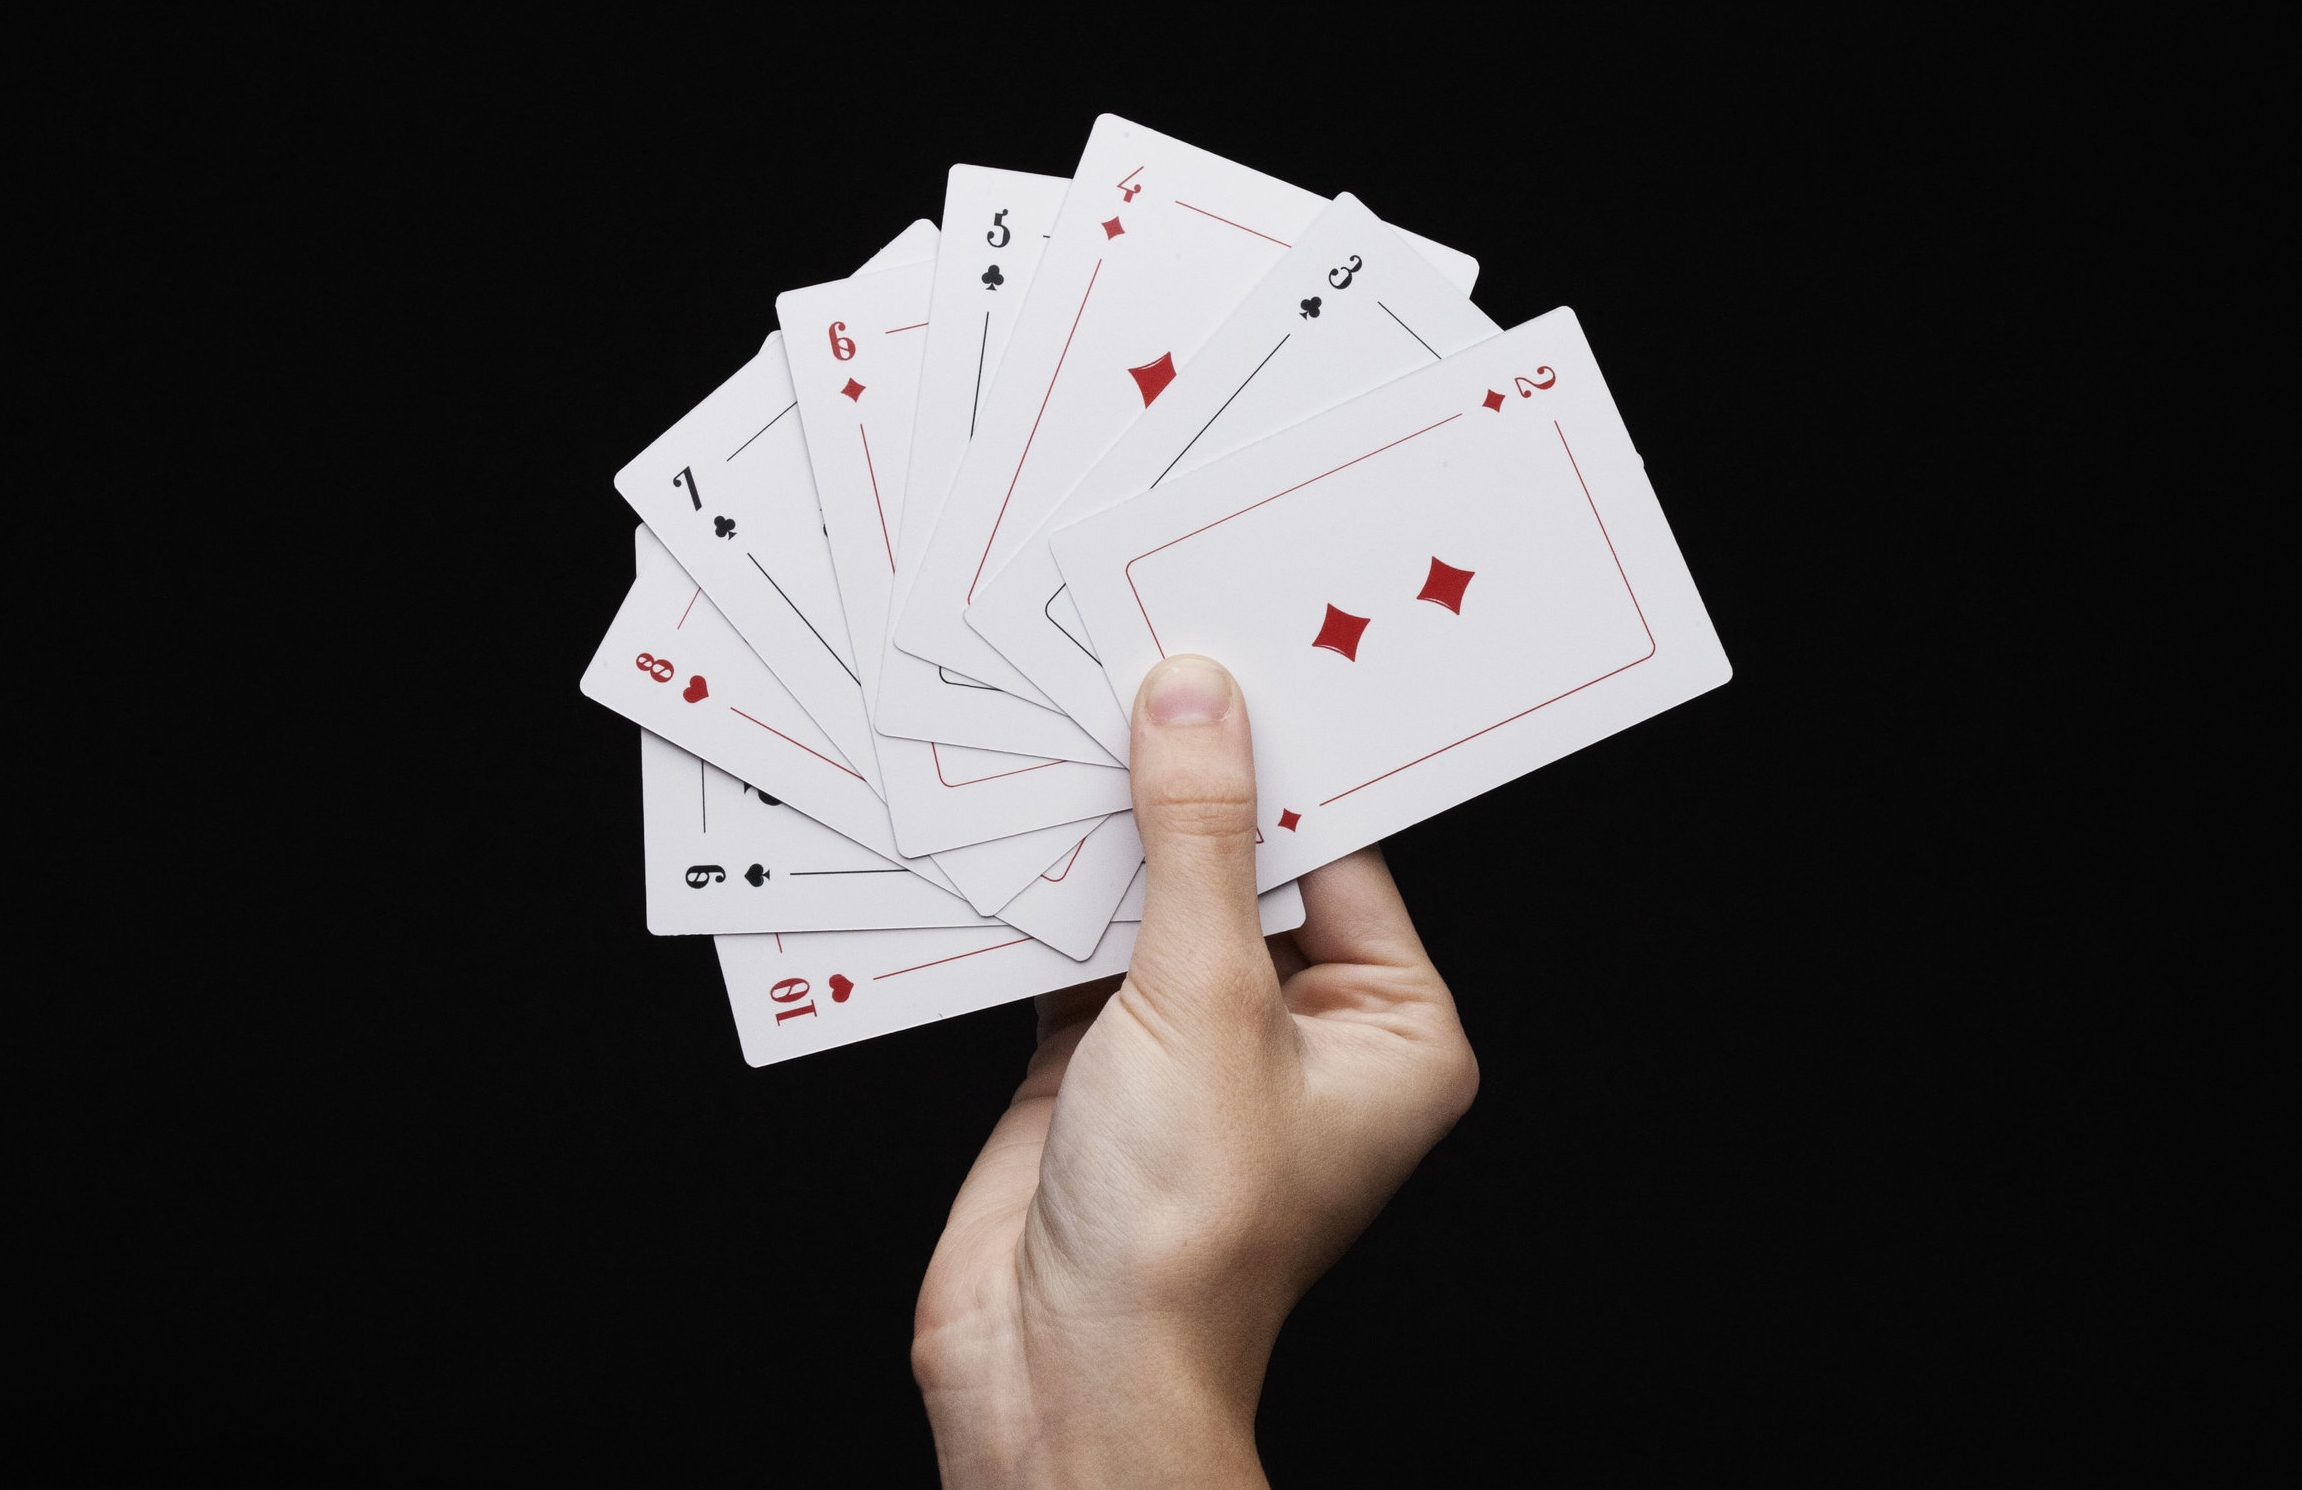 cards_hand.jpg